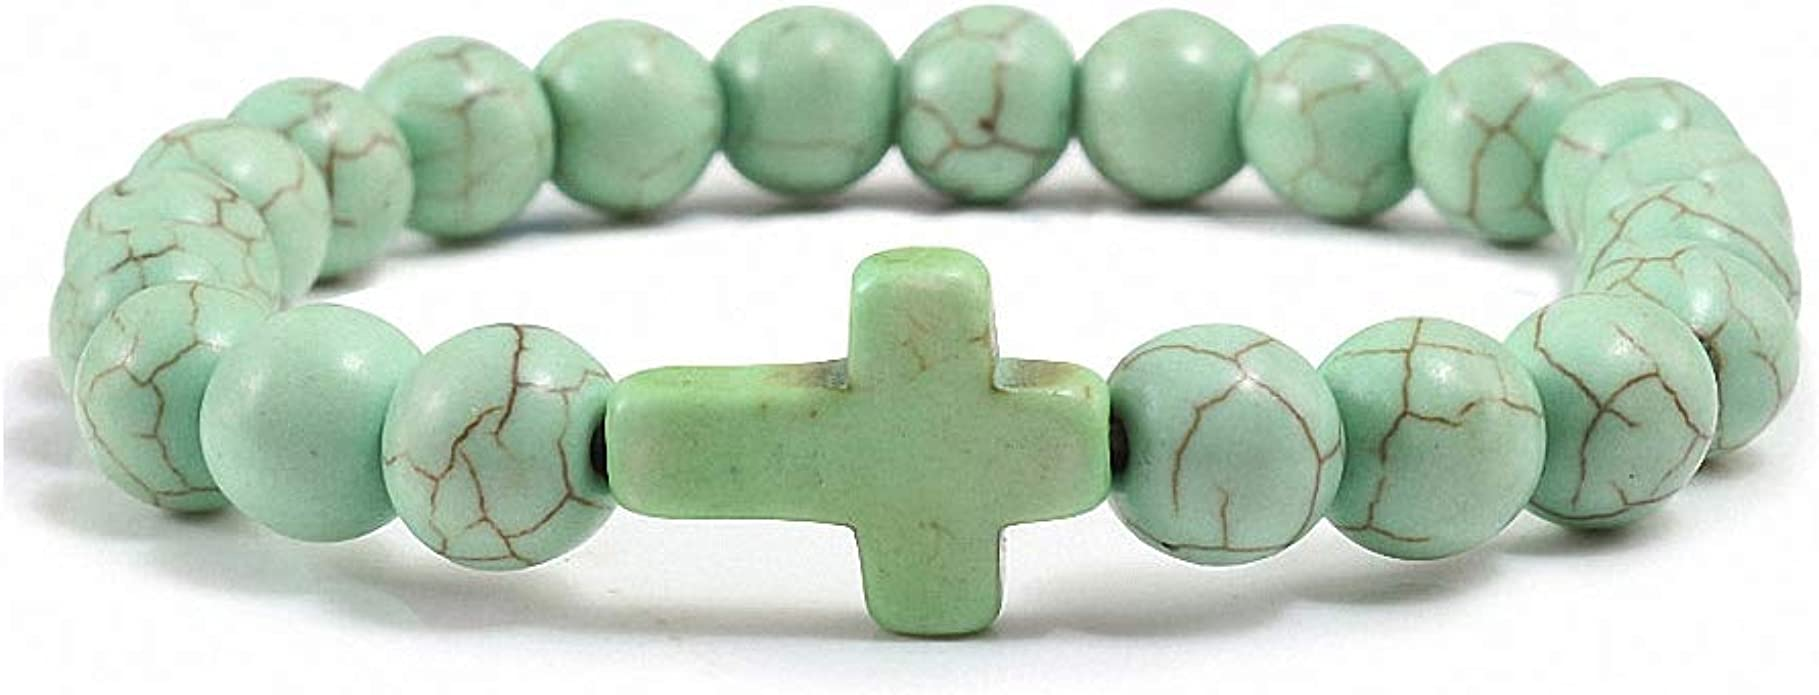 Dangle Cross Charms Gold Charm Bracelet Gemstone Bracelet Layered Bracelets Natural Stone Bracelet